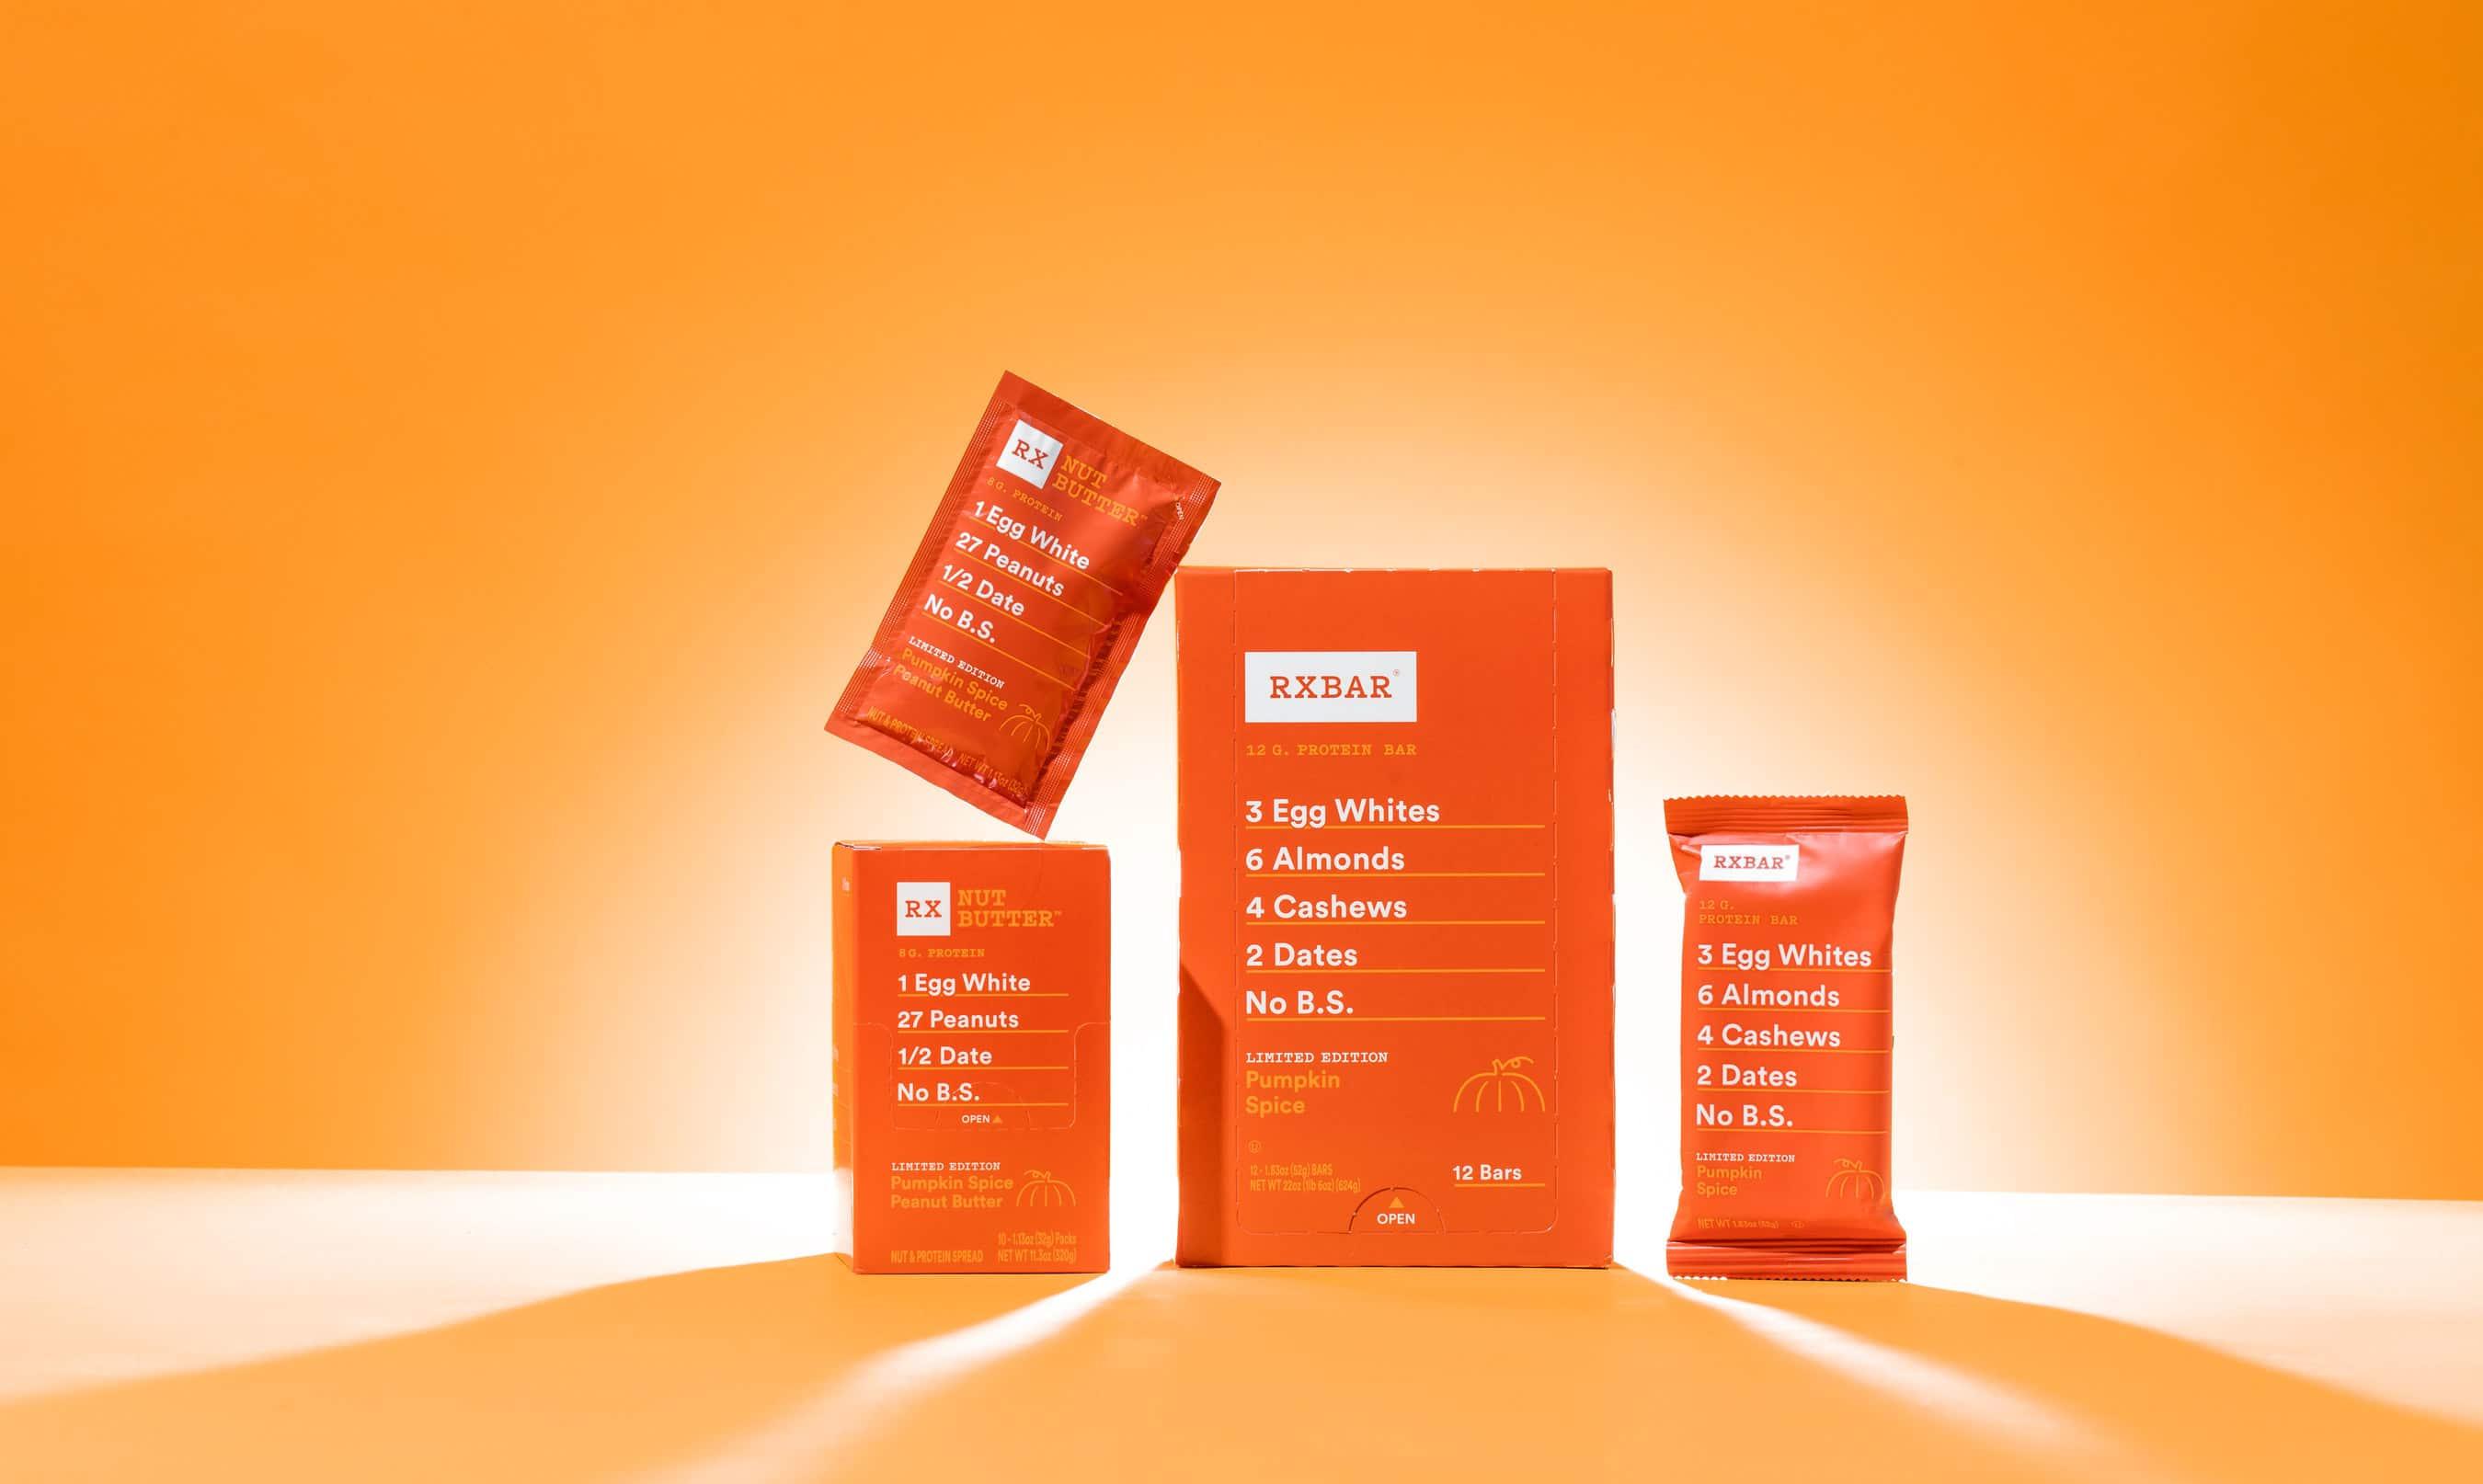 RXBAR Unveils Limited Edition Pumpkin Spice Peanut Butter